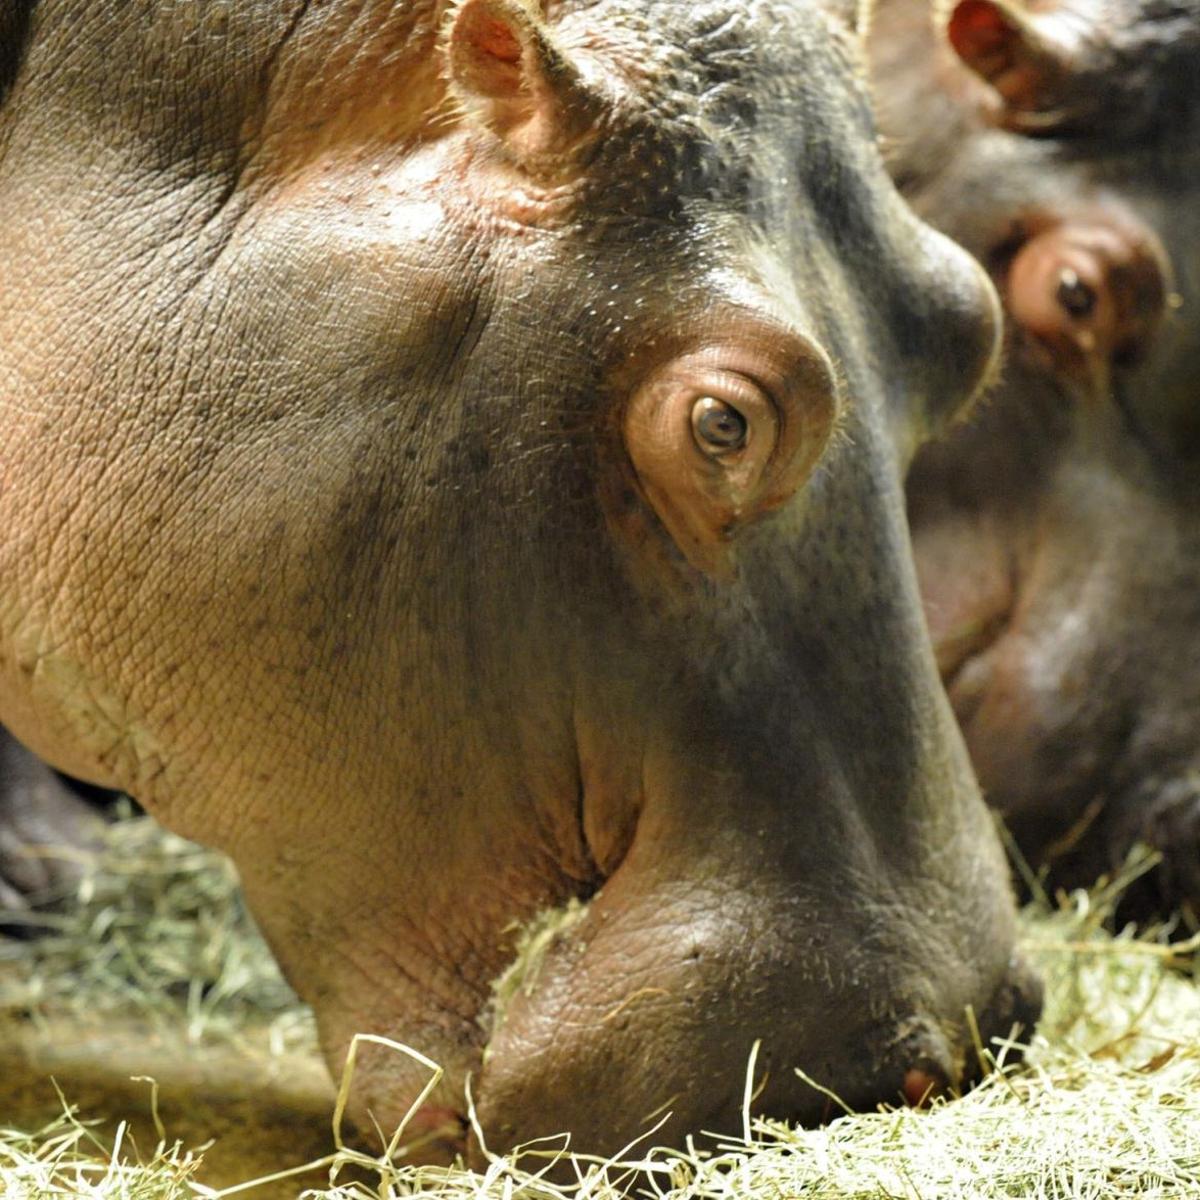 2 hippos to return to Cheyenne Mountain Zoo after Missouri